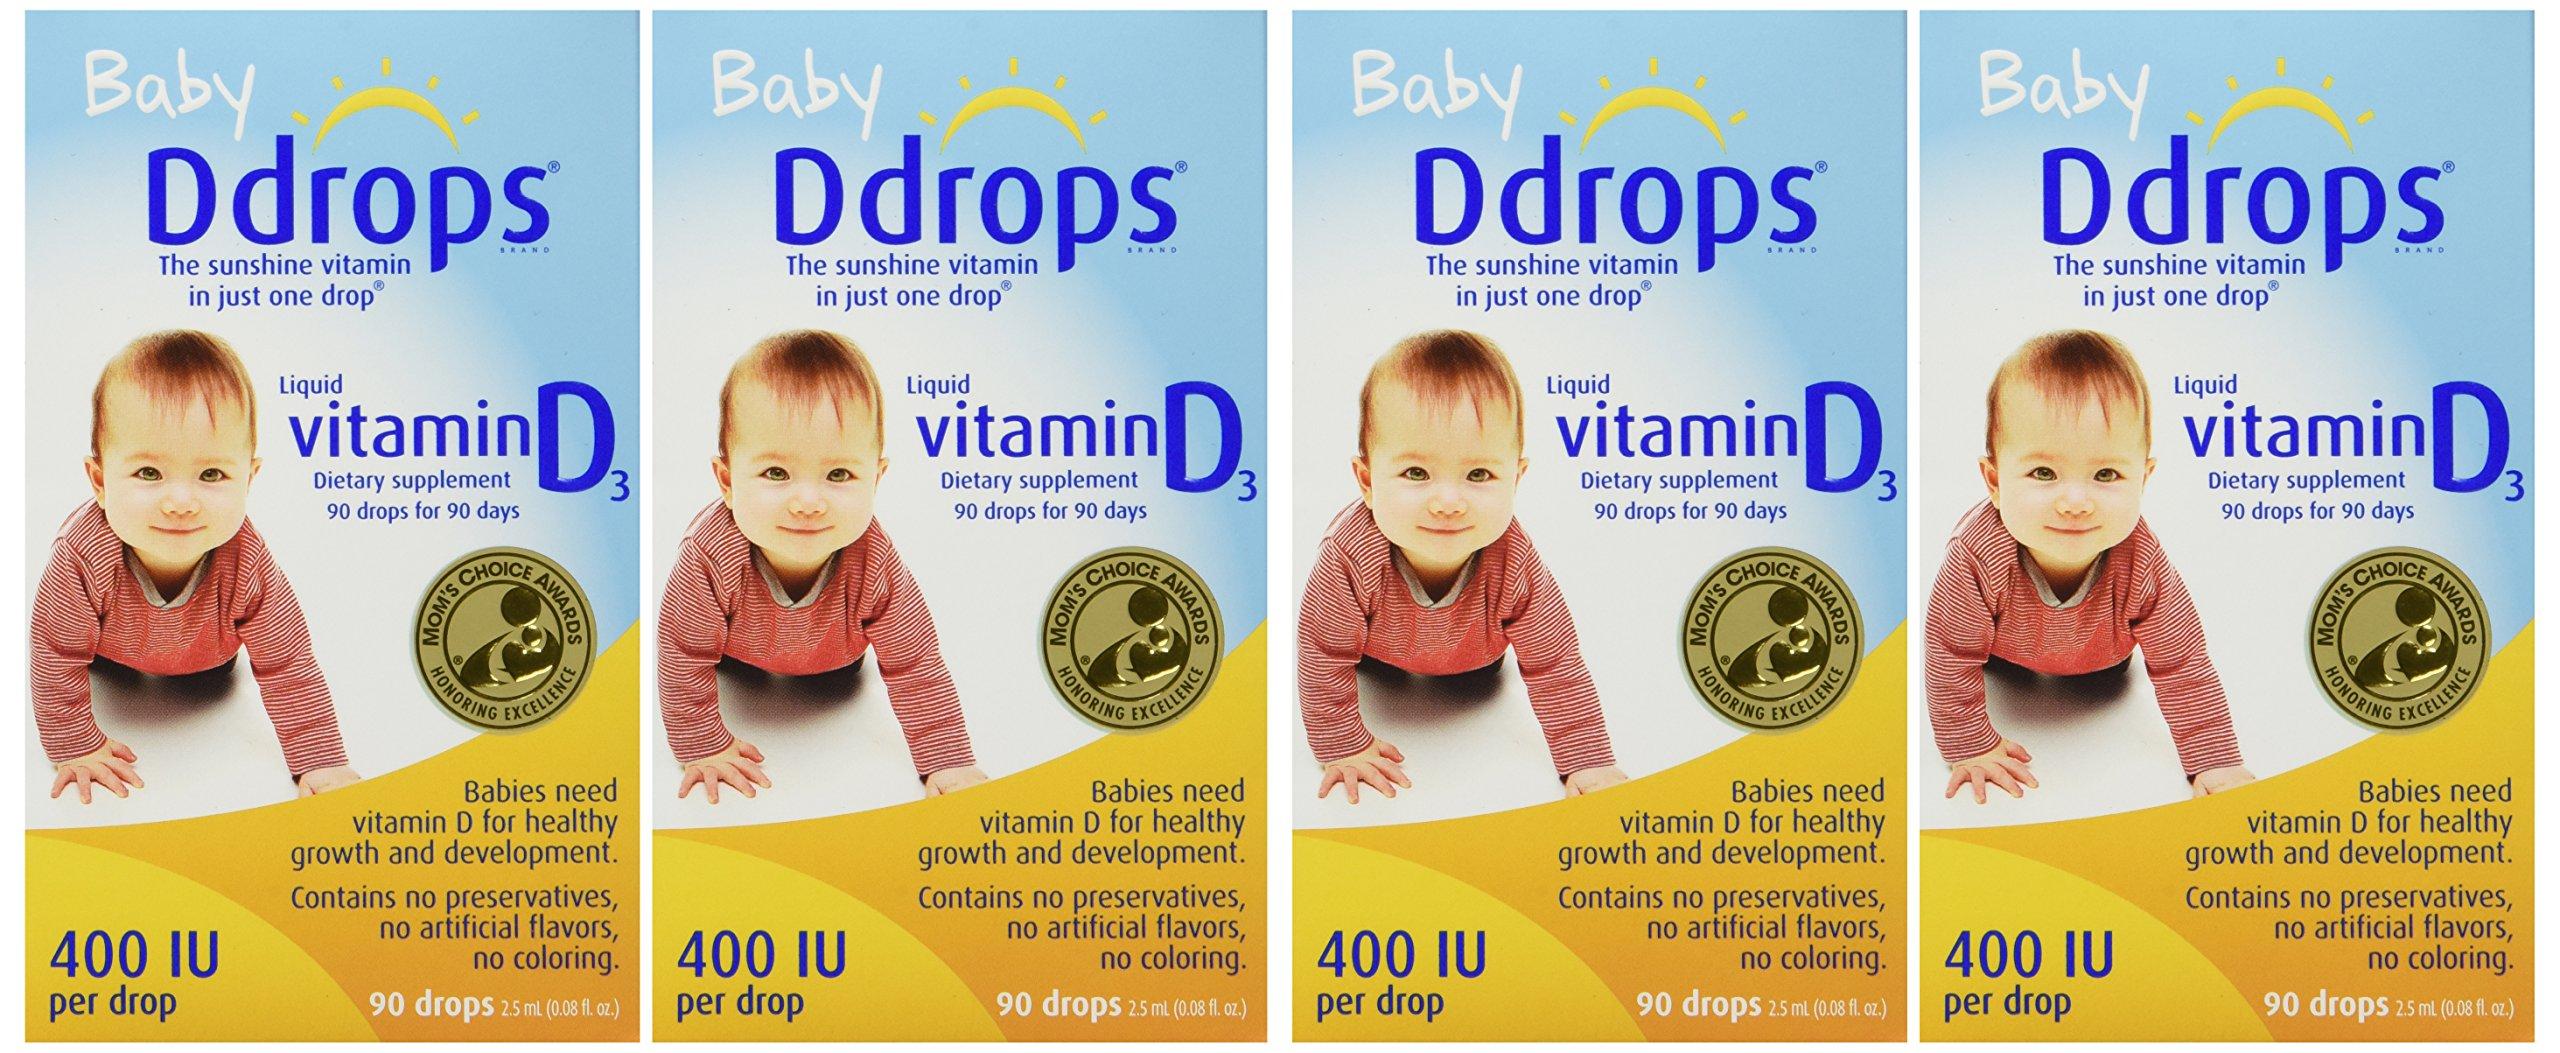 Ddrops Baby 400 Iu 90 Drops 0.08 Fluid Ounce (4 Pack) by Ddrops